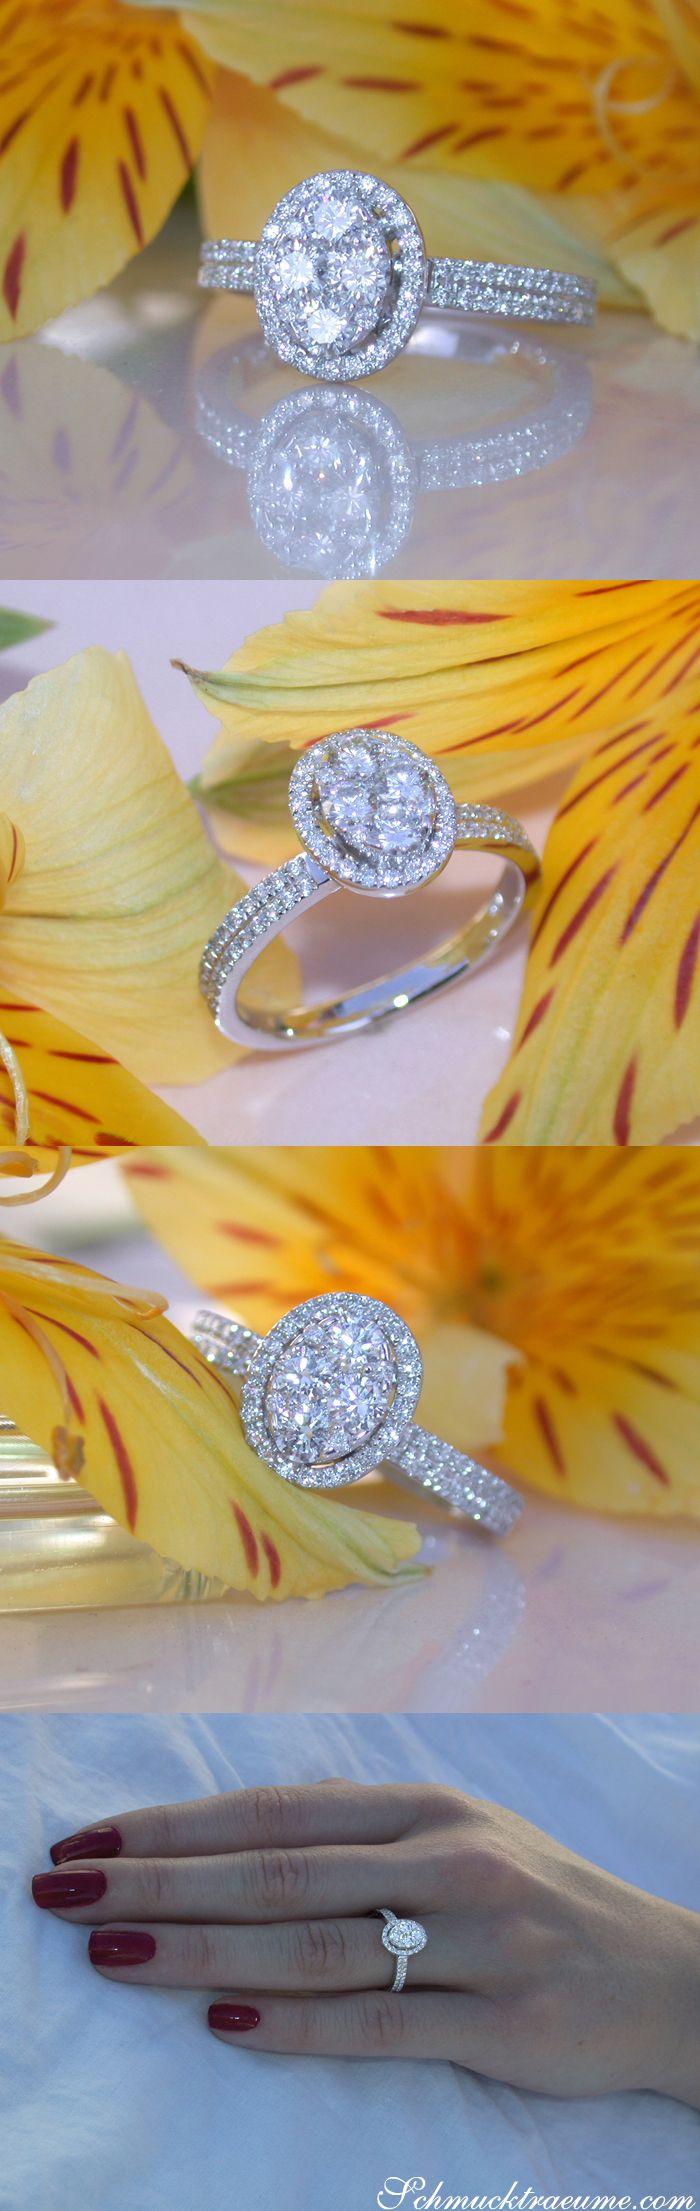 Simple elegance: Oval Diamond Ring - 0.81 ct. G VS2 - Whitegold 18k   schmucktraeume.com   FB: https://www.facebook.com/Noble-Juwelen-150871984924926/